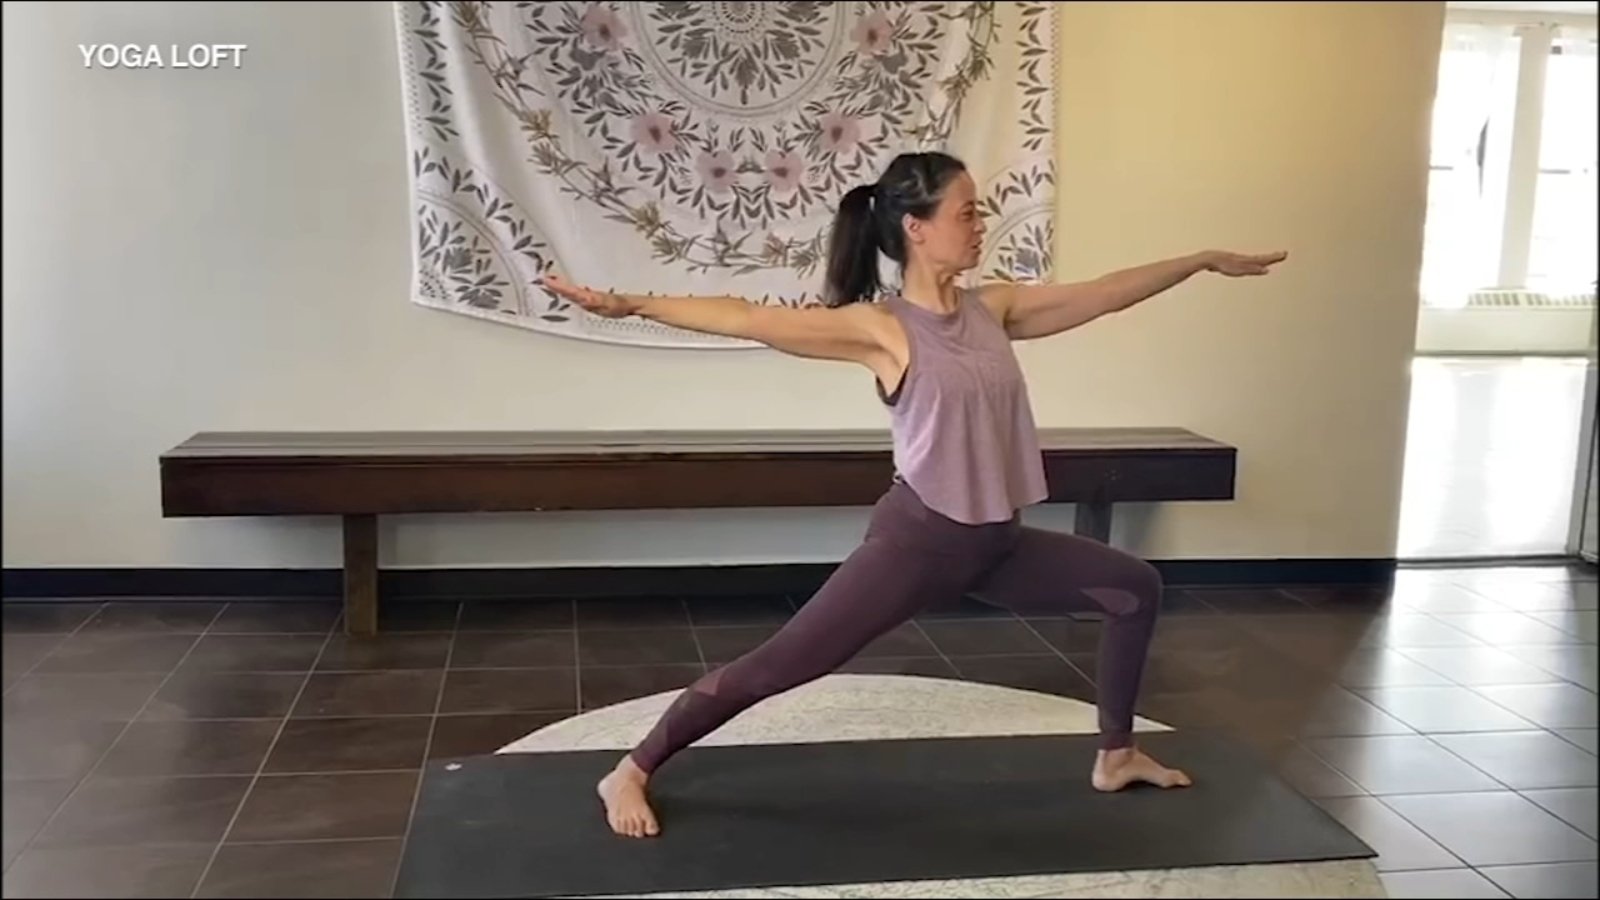 Coronavirus Chicago Yoga Loft Studios Offers Virtual Classes During Covid 19 Pandemic Abc7 Chicago